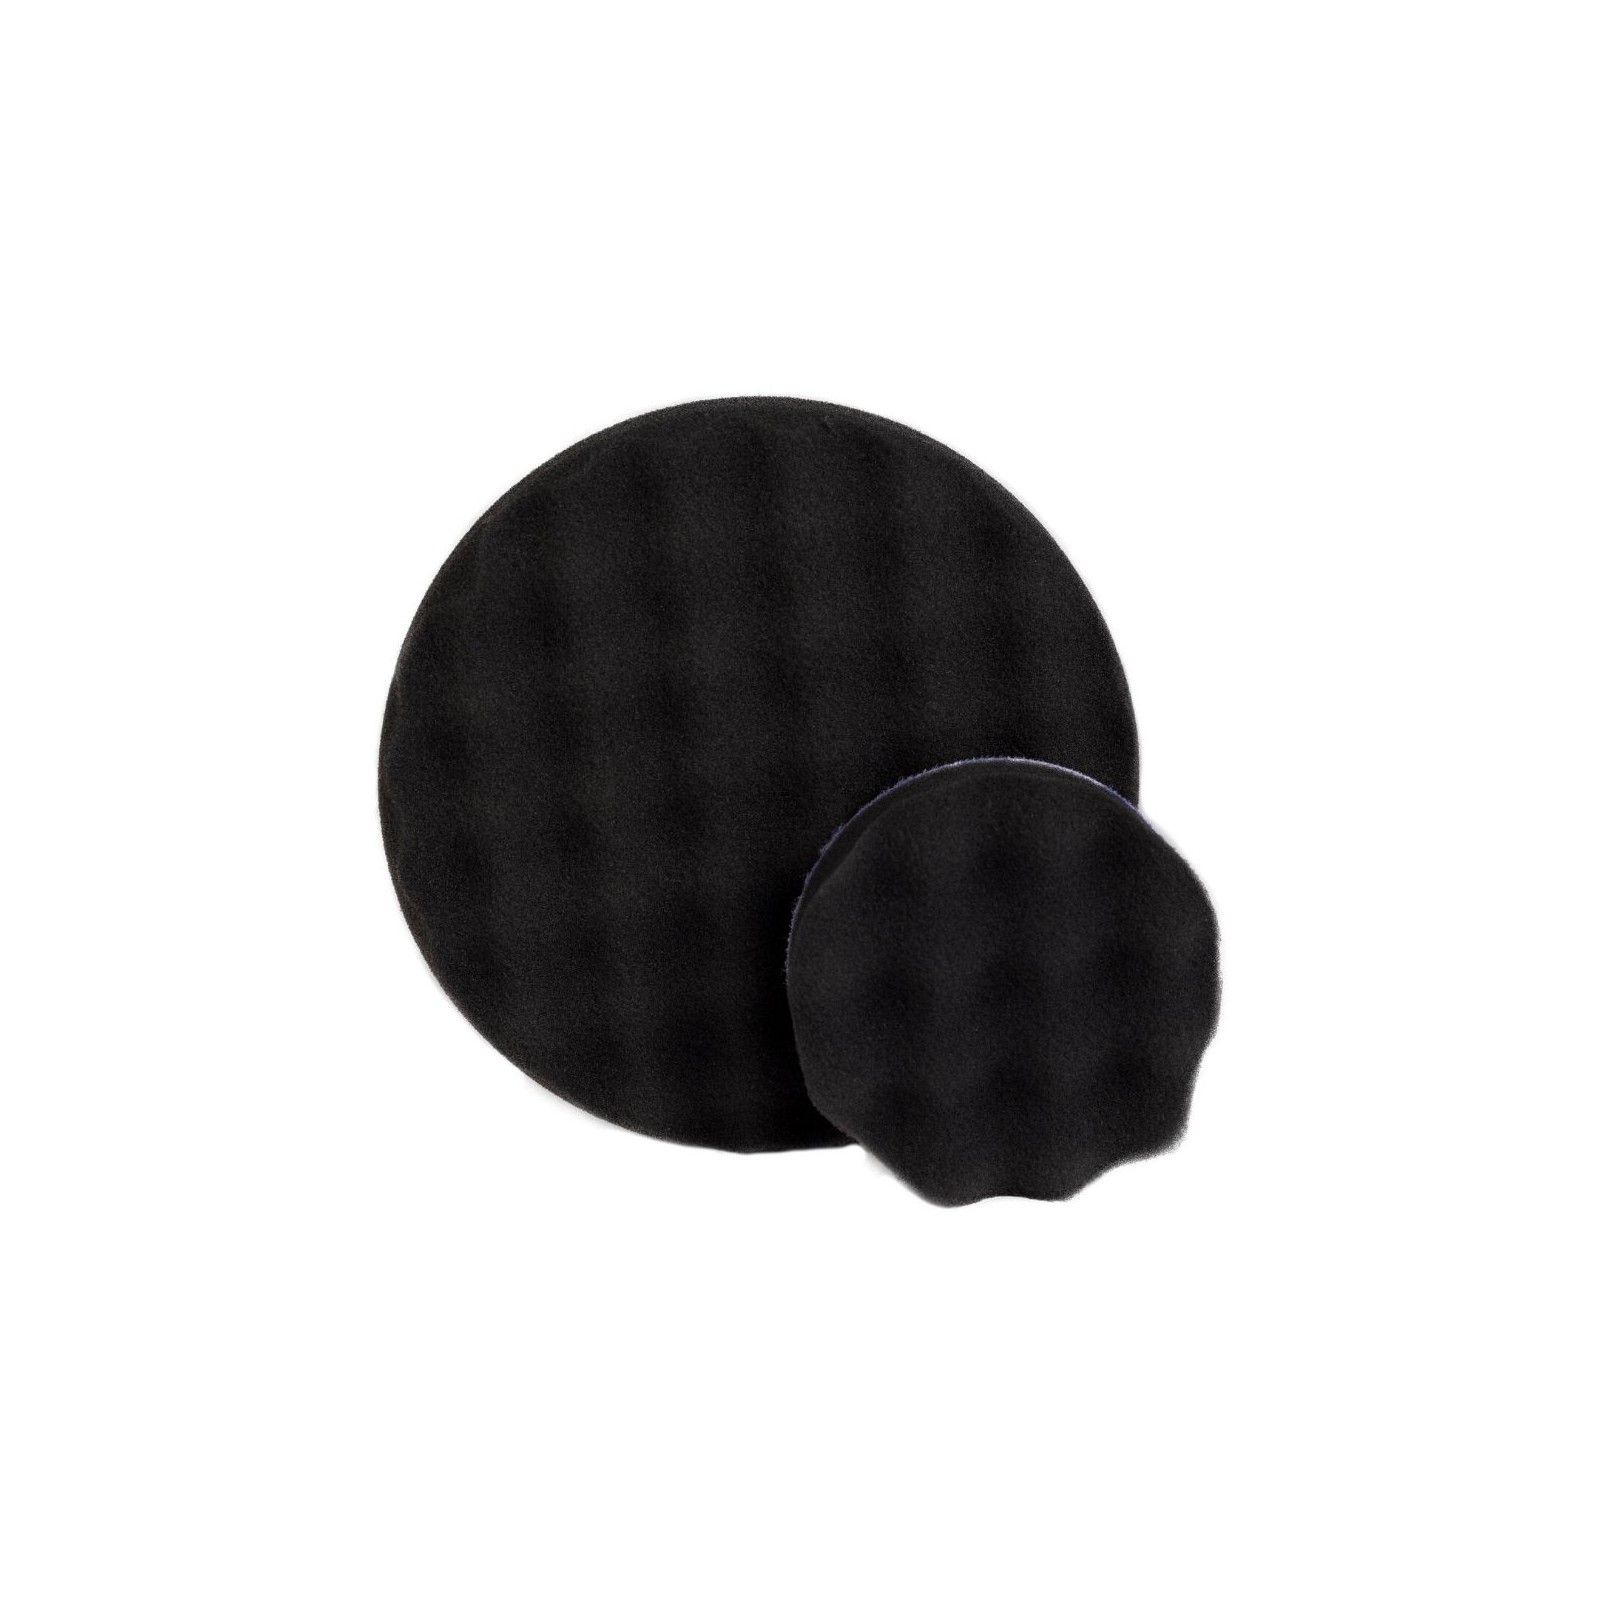 Refinish Polijstpad Foam roterend, ultra-soft, grijs